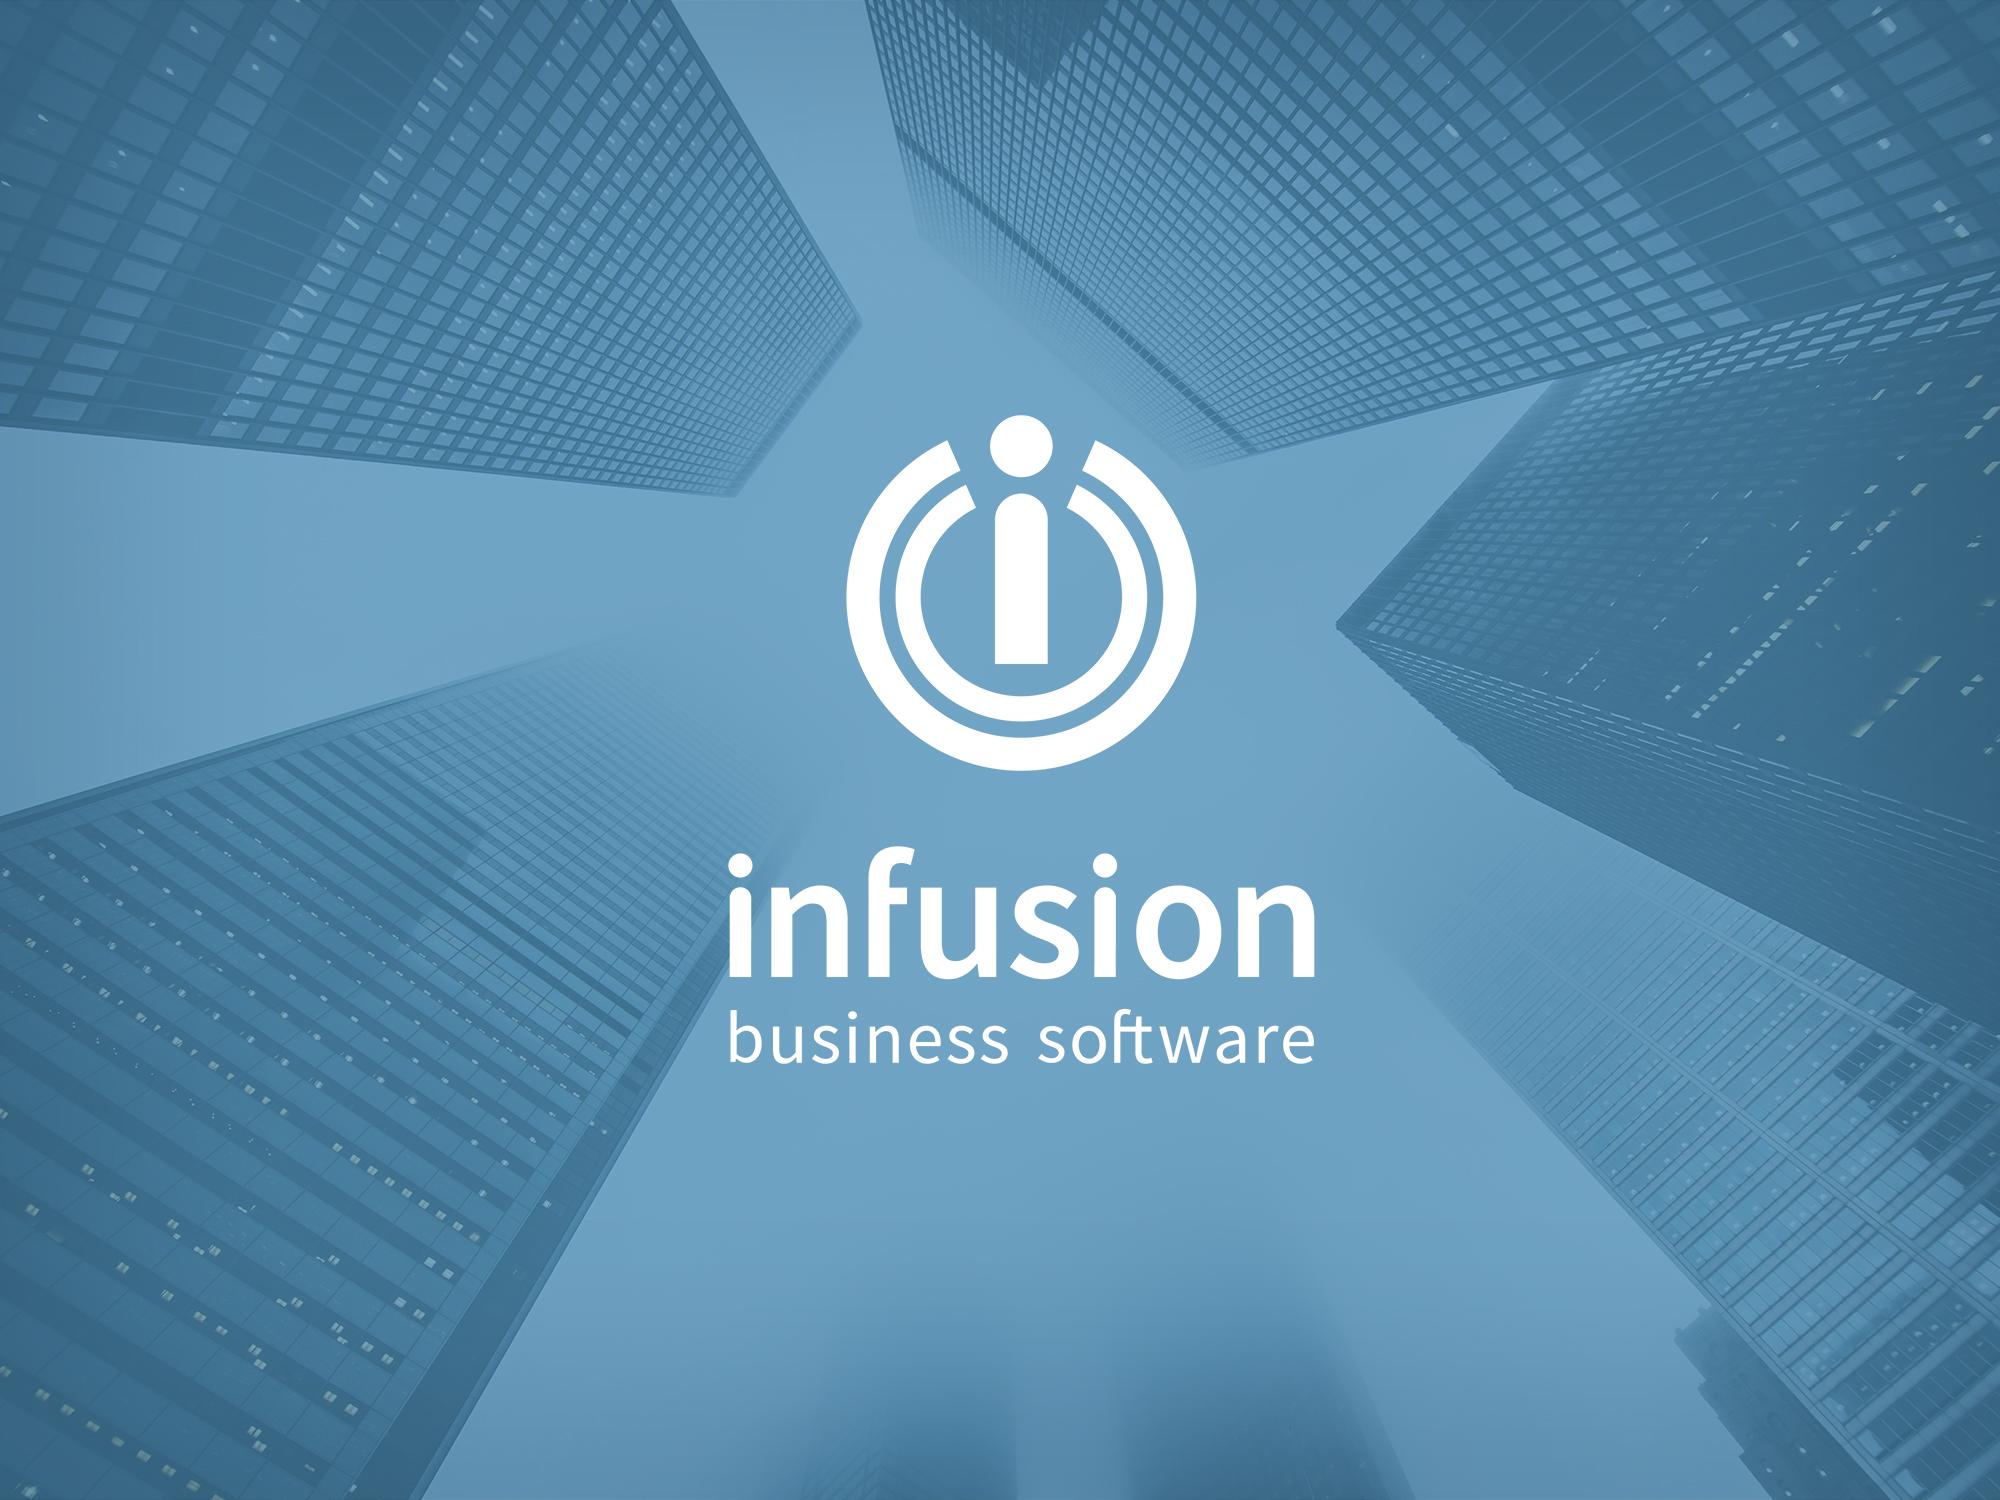 infusionlogostacked.jpg